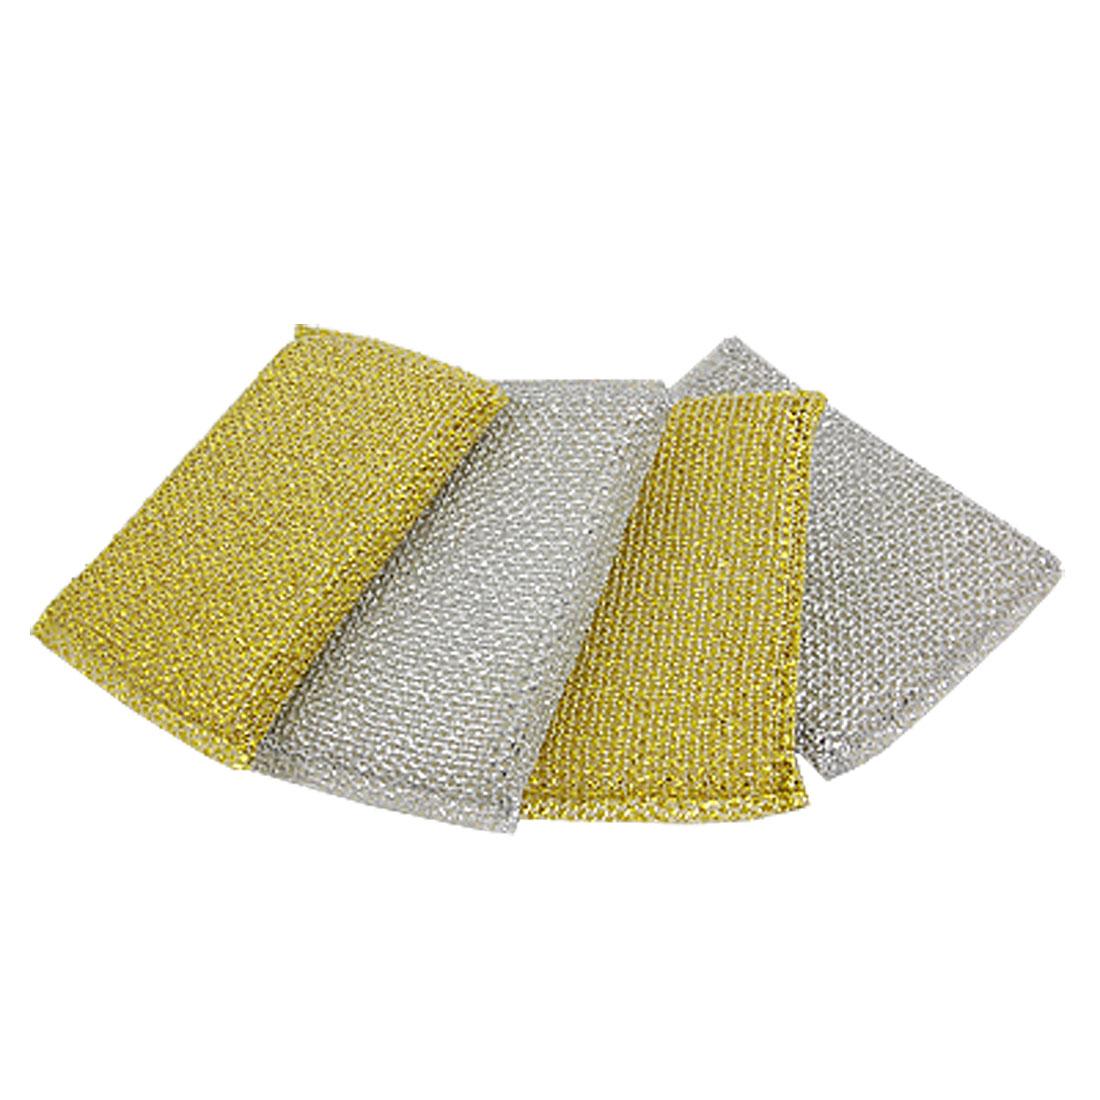 4 Pcs Dish Bowl Cleaning Metallic Thread Sponge Scrubing Pad Gold Tone Silver Tone